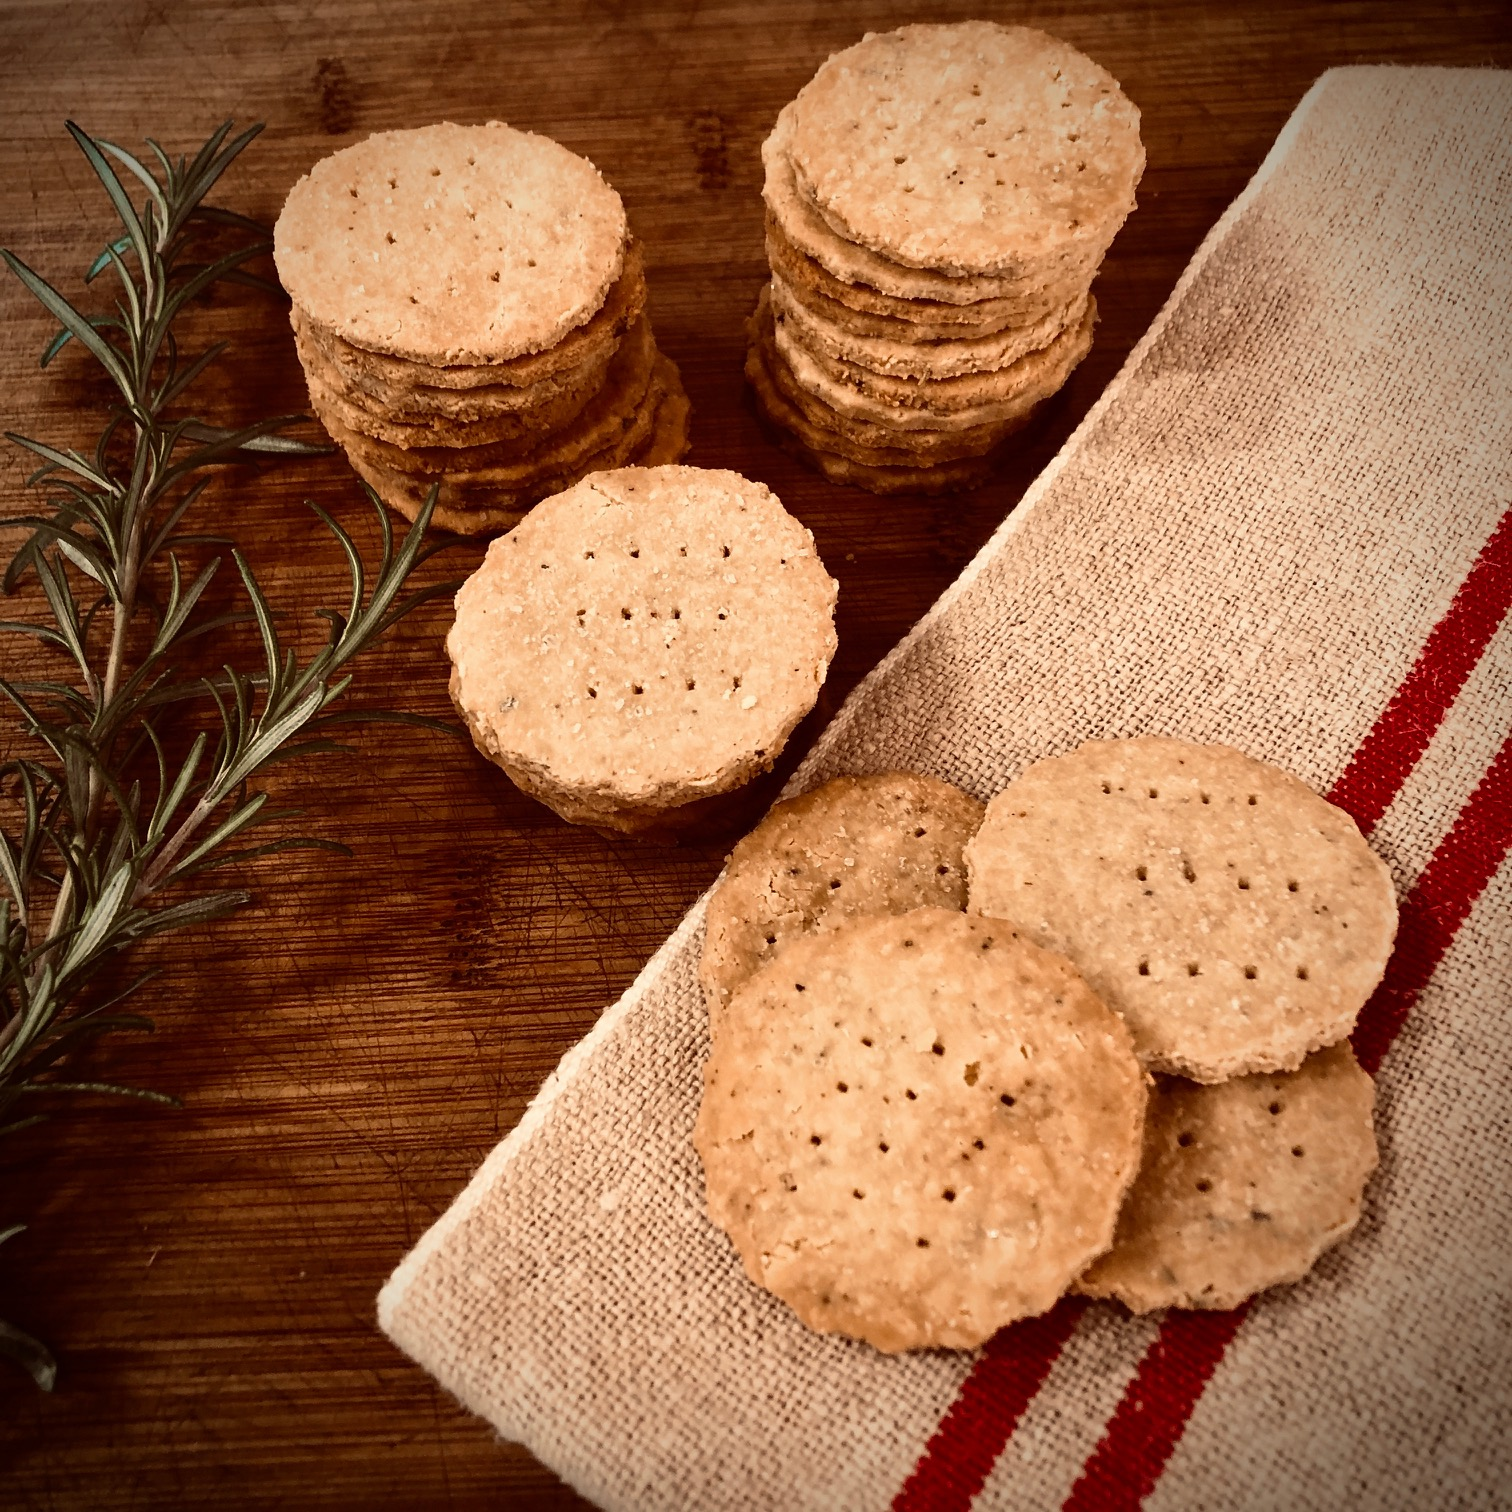 Chickpea & Almond Crackers